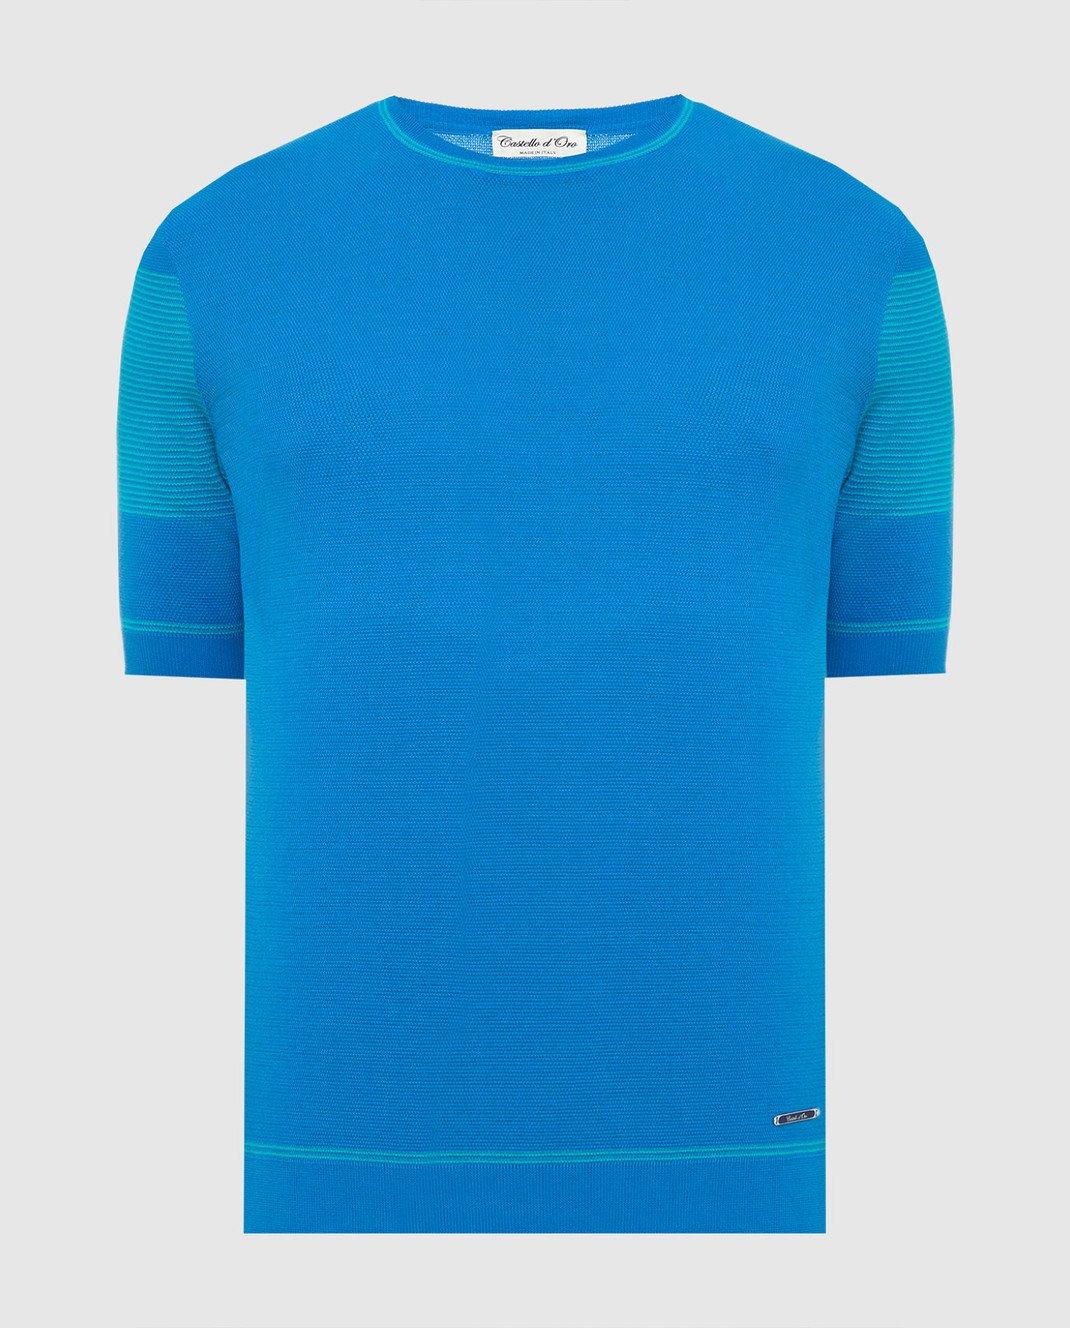 Castello d'Oro Синяя футболка изображение 1